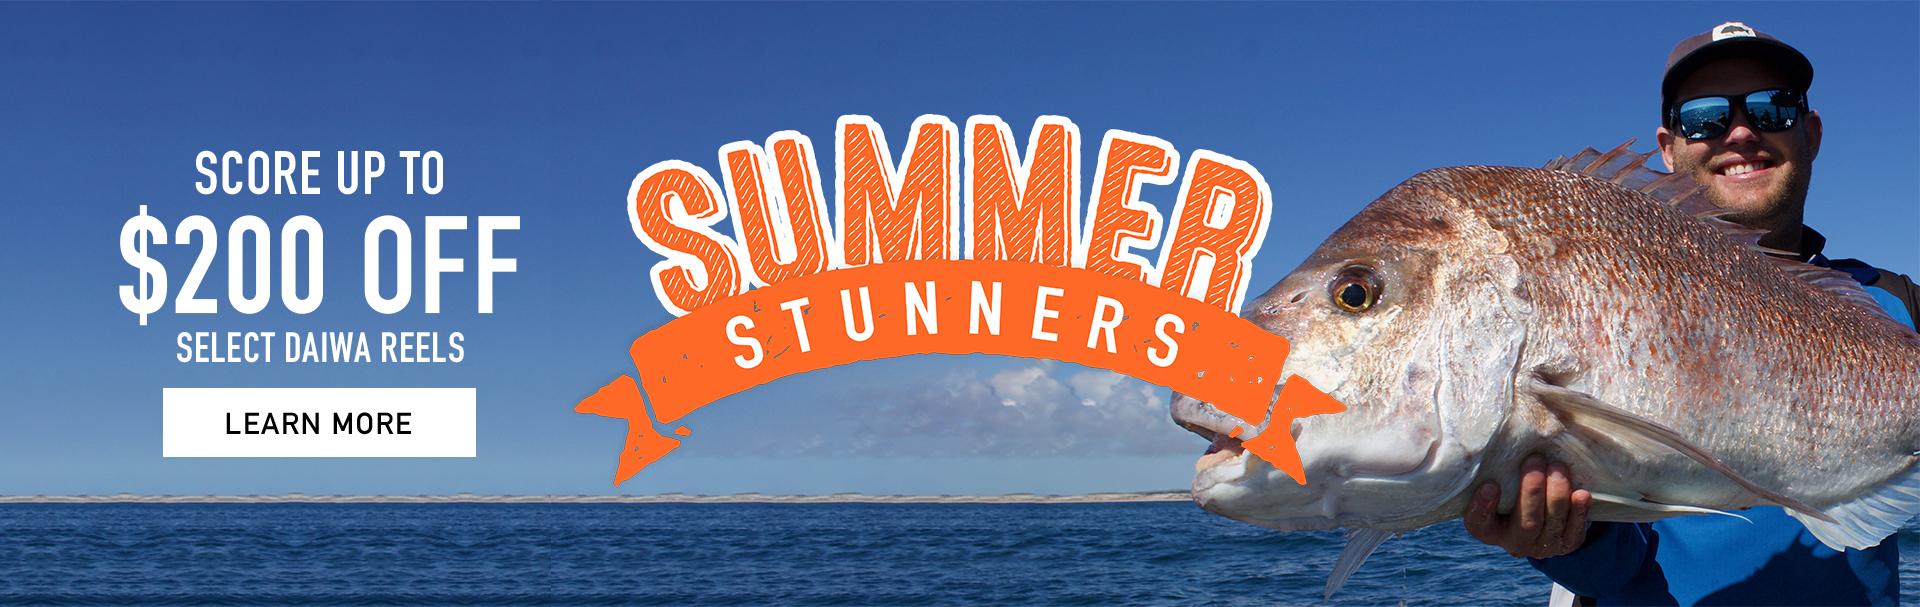 Summer Stunner Deals Daiwa Fishing Reels